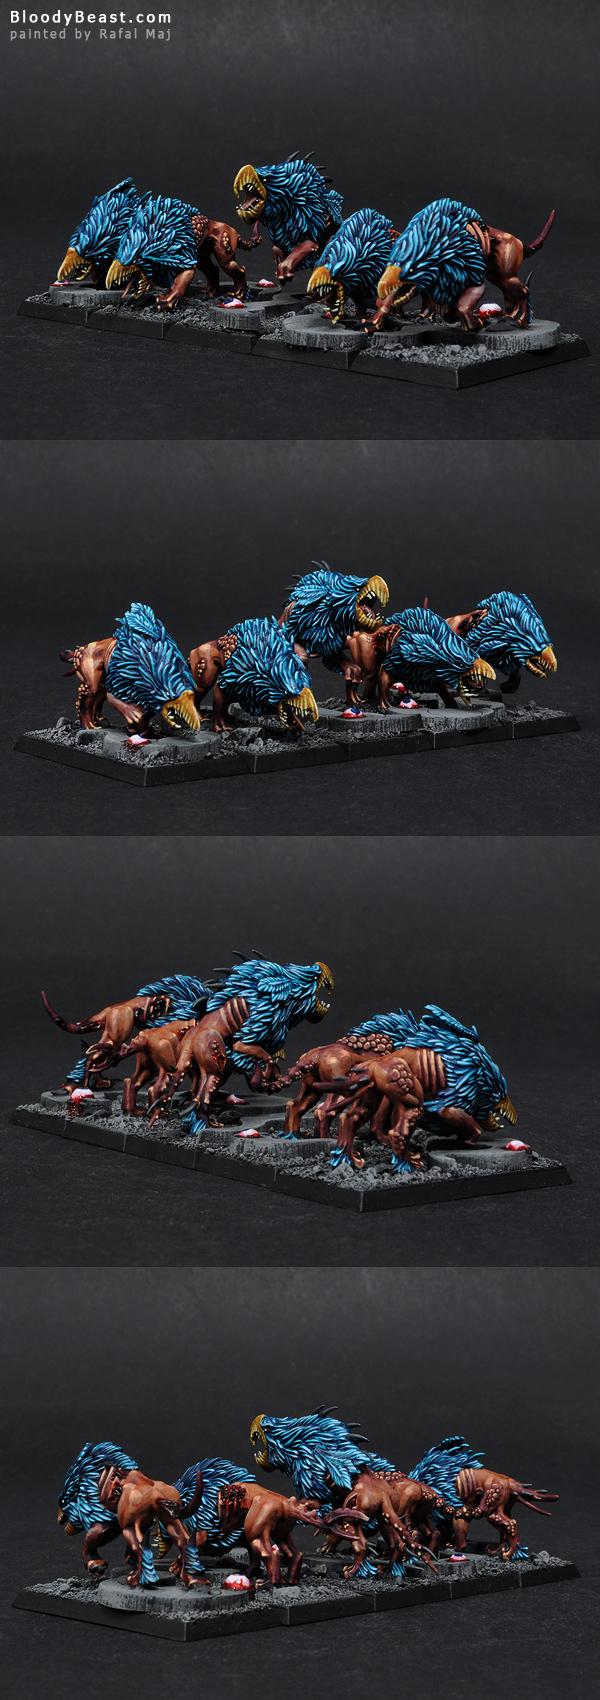 Chaos Warhounds of Tzeentch painted by Rafal Maj (BloodyBeast.com}